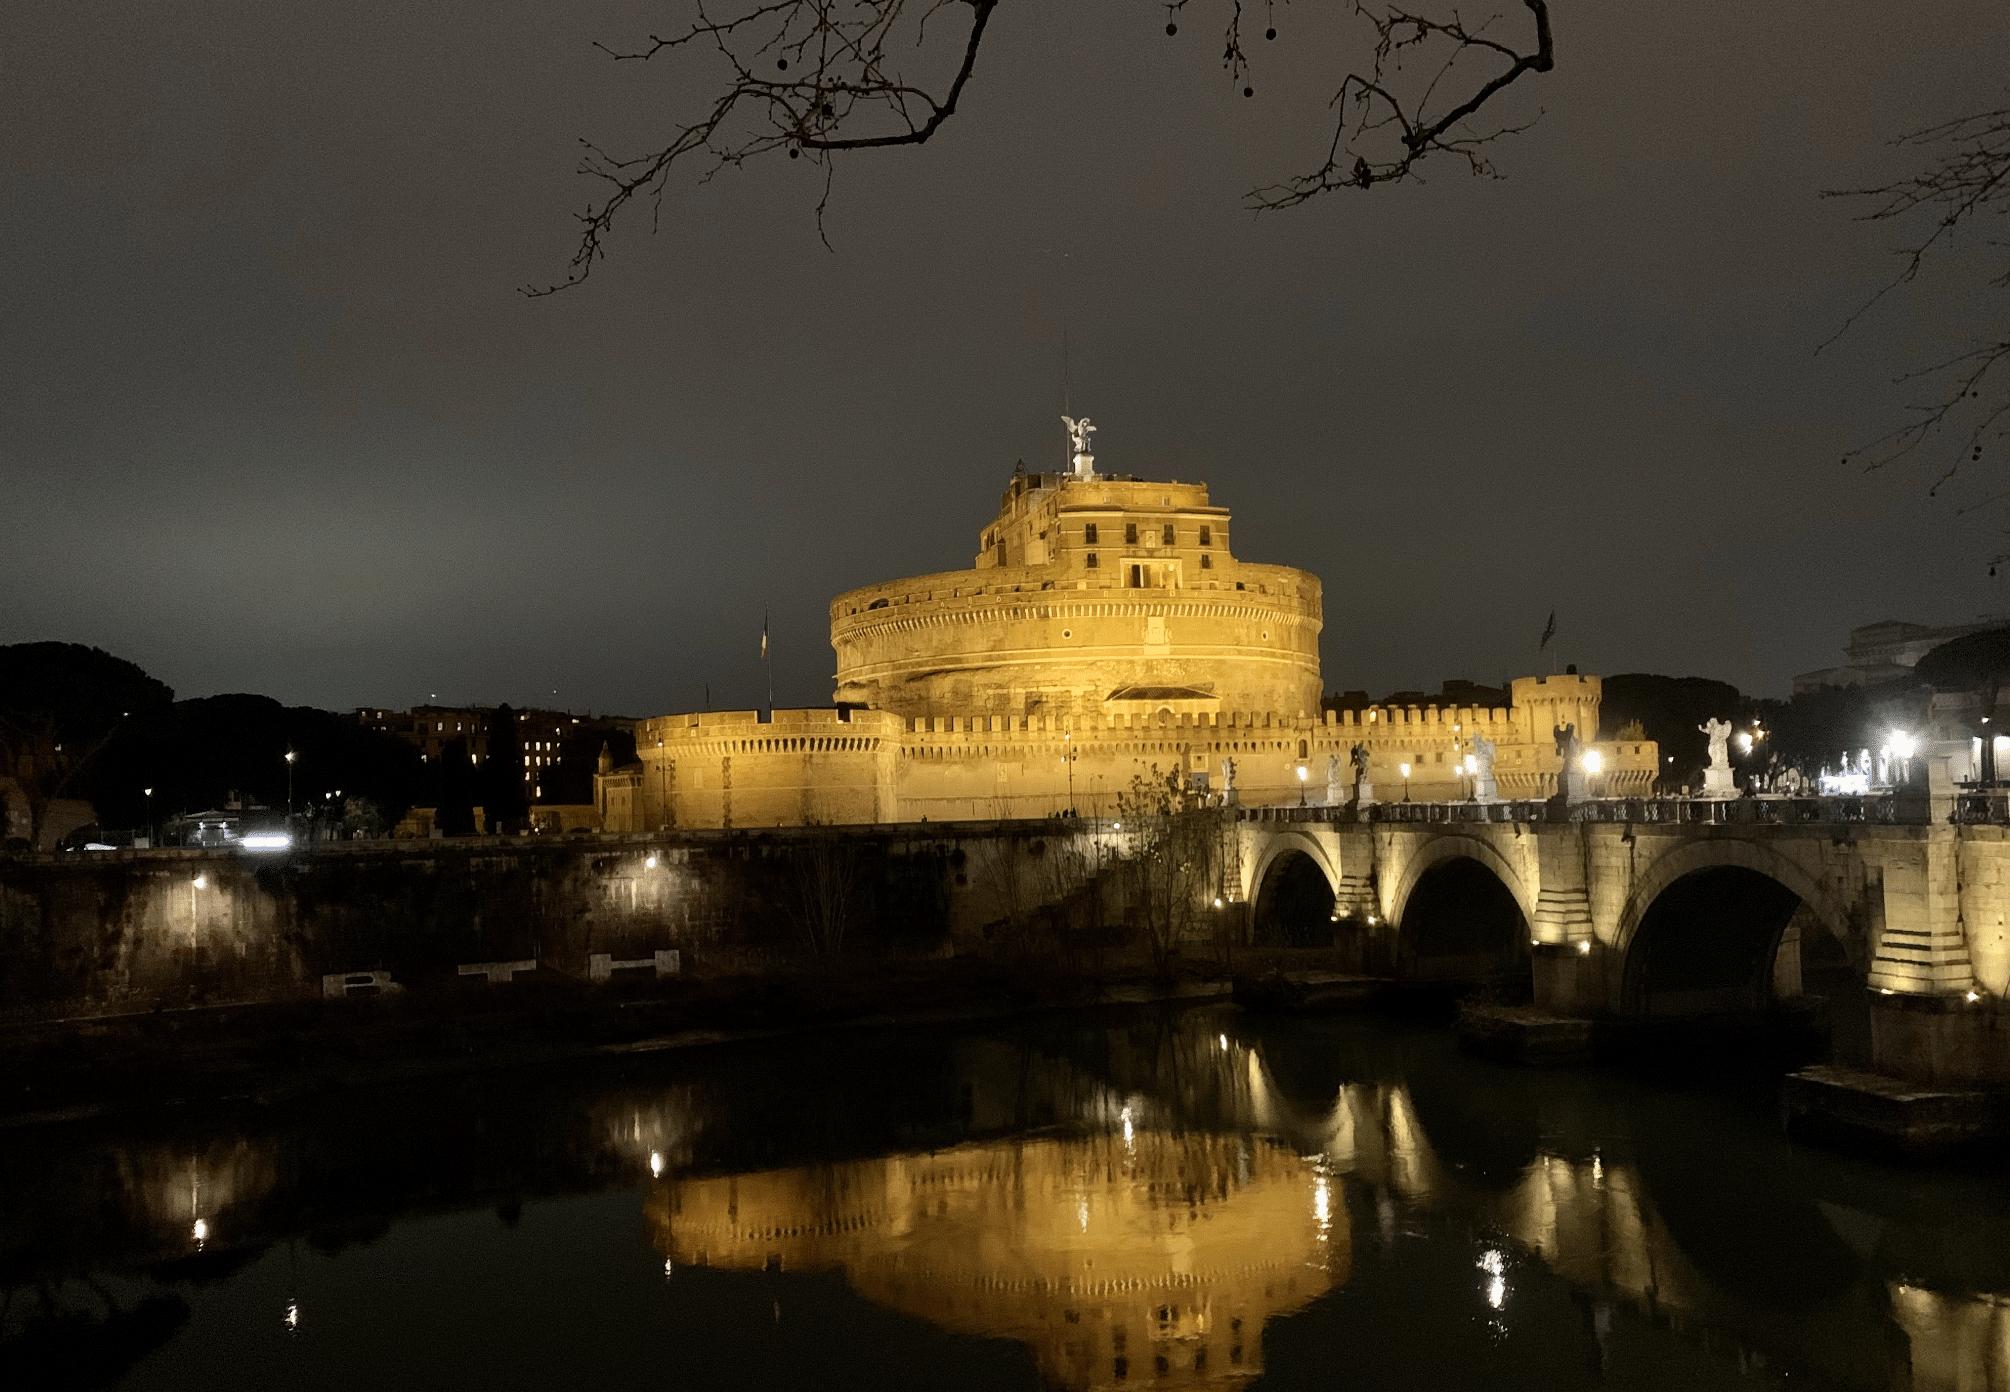 visiter rome : le chateau saint ange